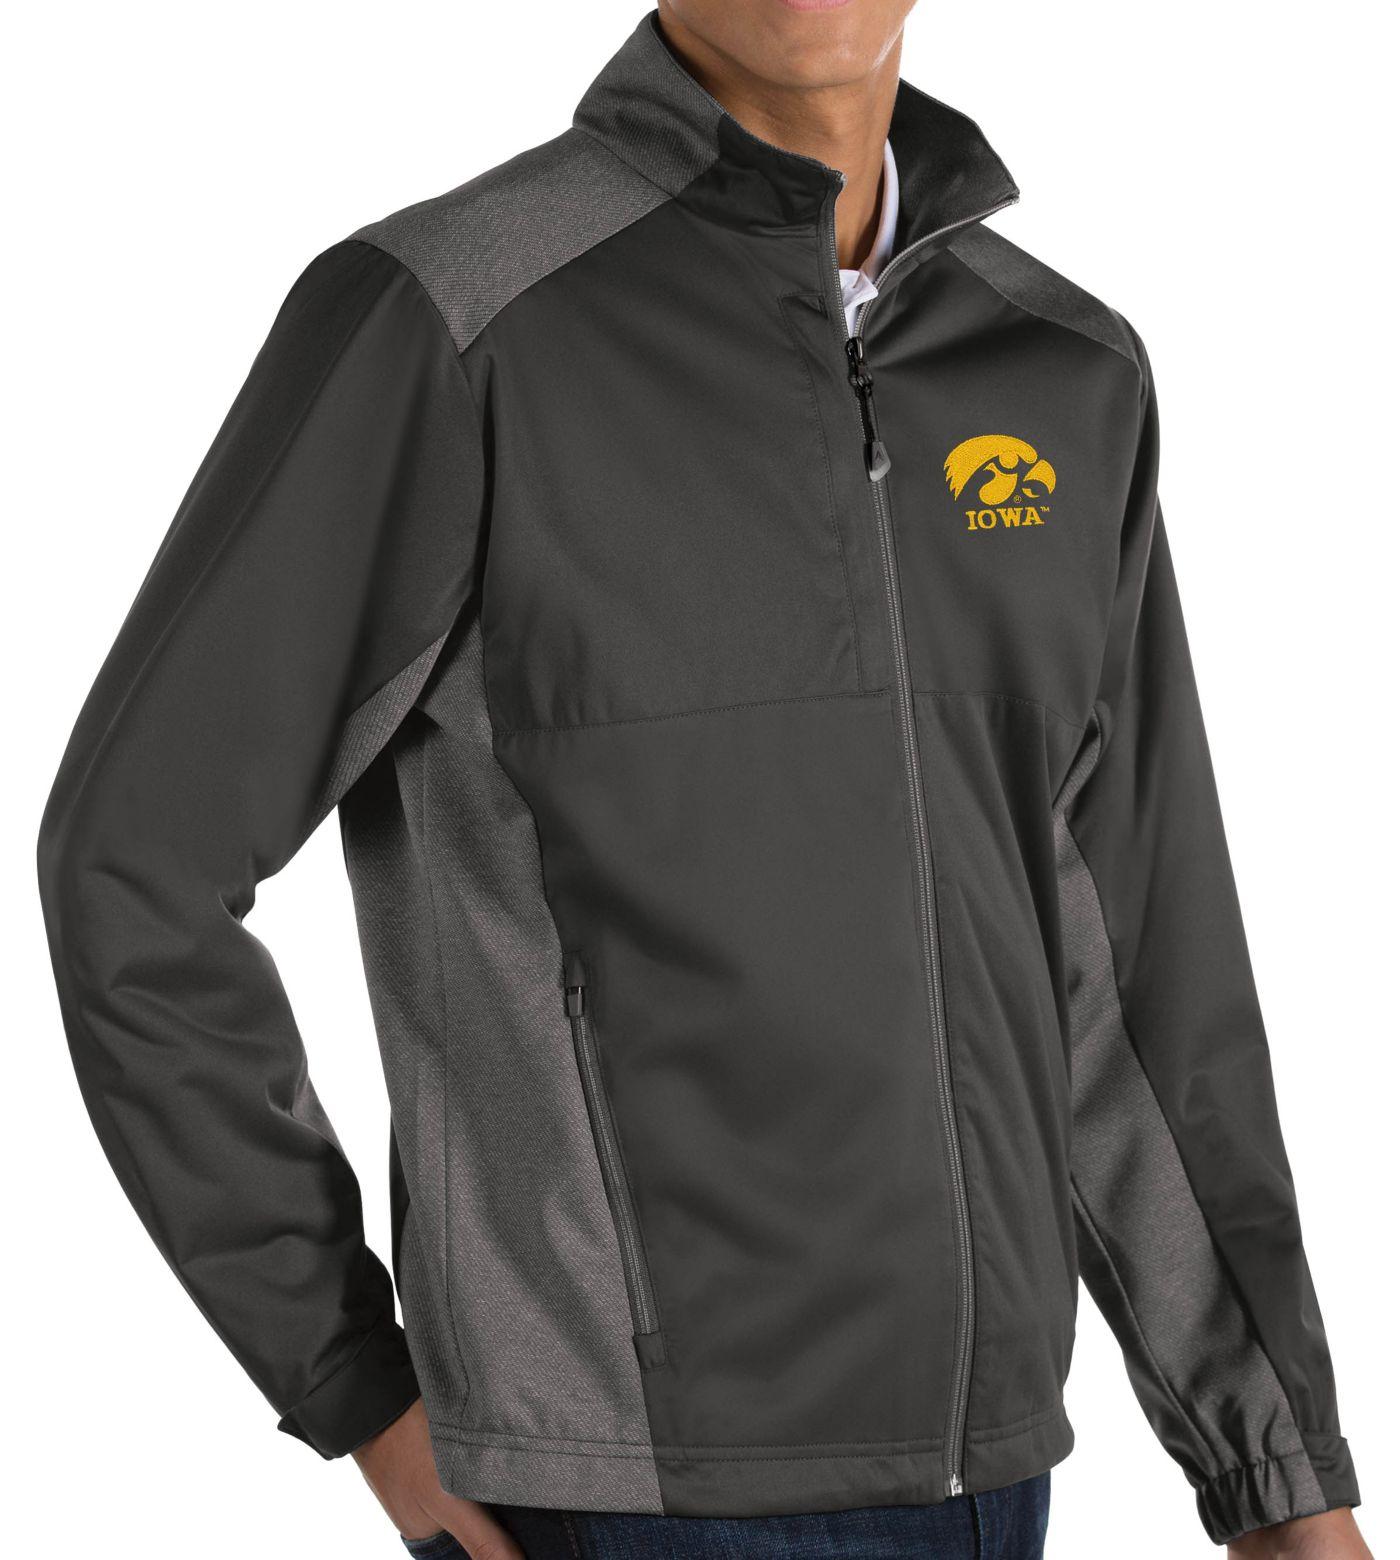 Antigua Men's Iowa Hawkeyes Grey Revolve Full-Zip Jacket